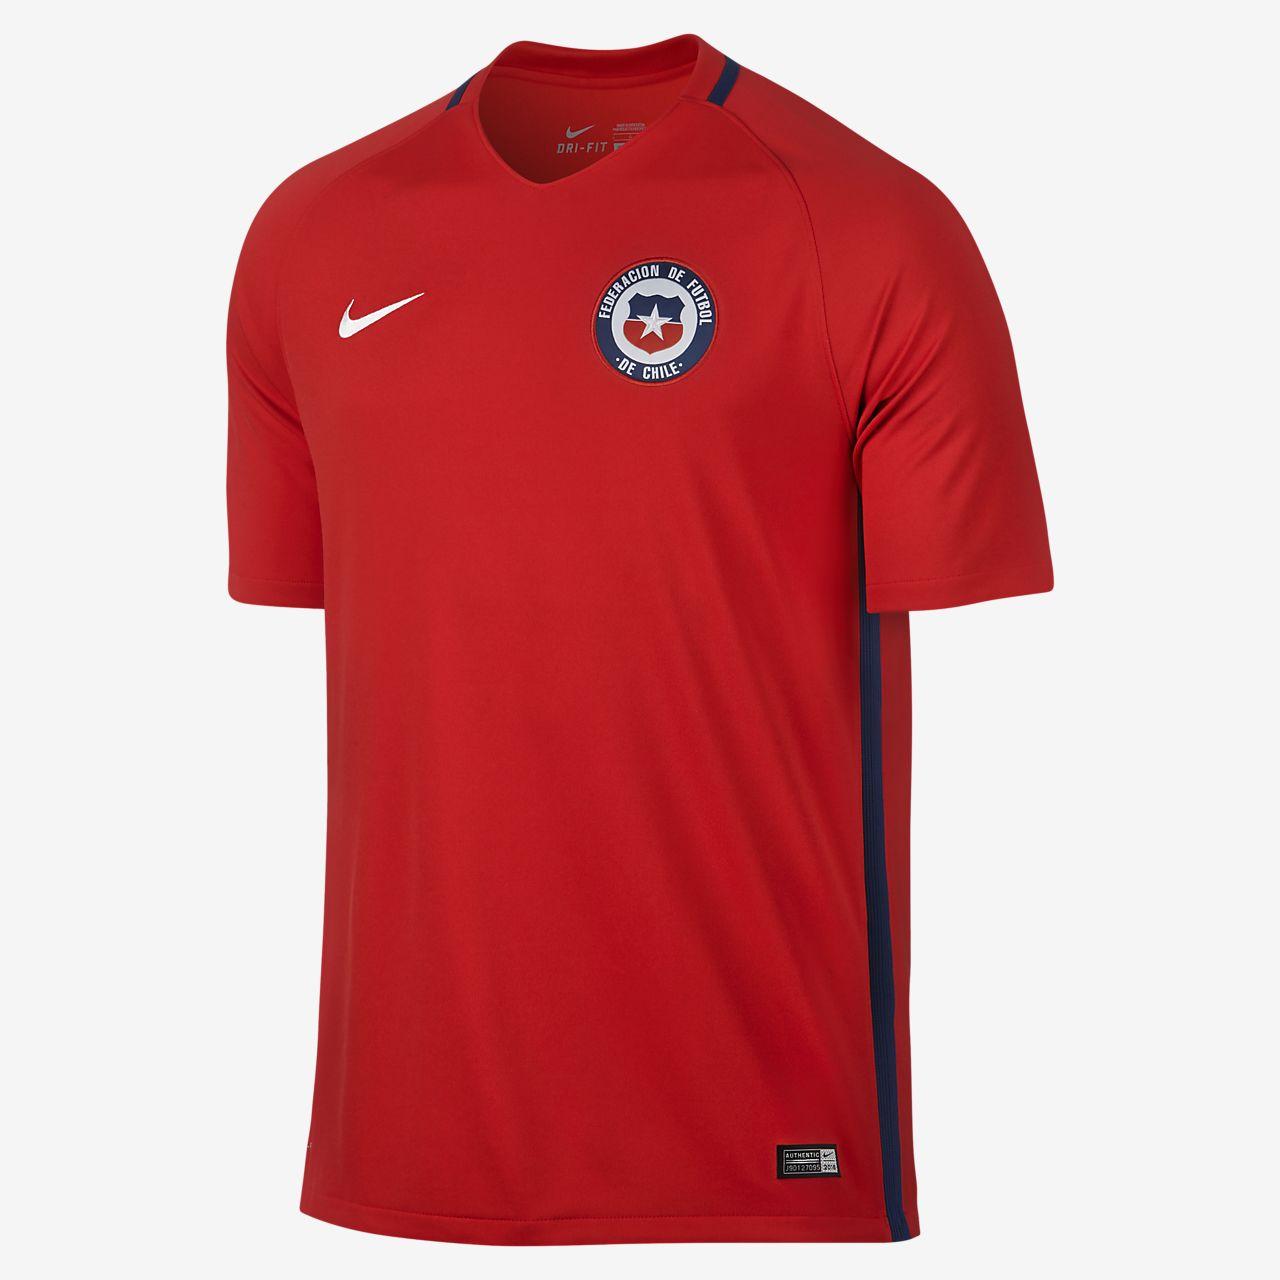 2016 Chile Stadium Home/Away Men\u0027s Football Shirt. Nike.com SA